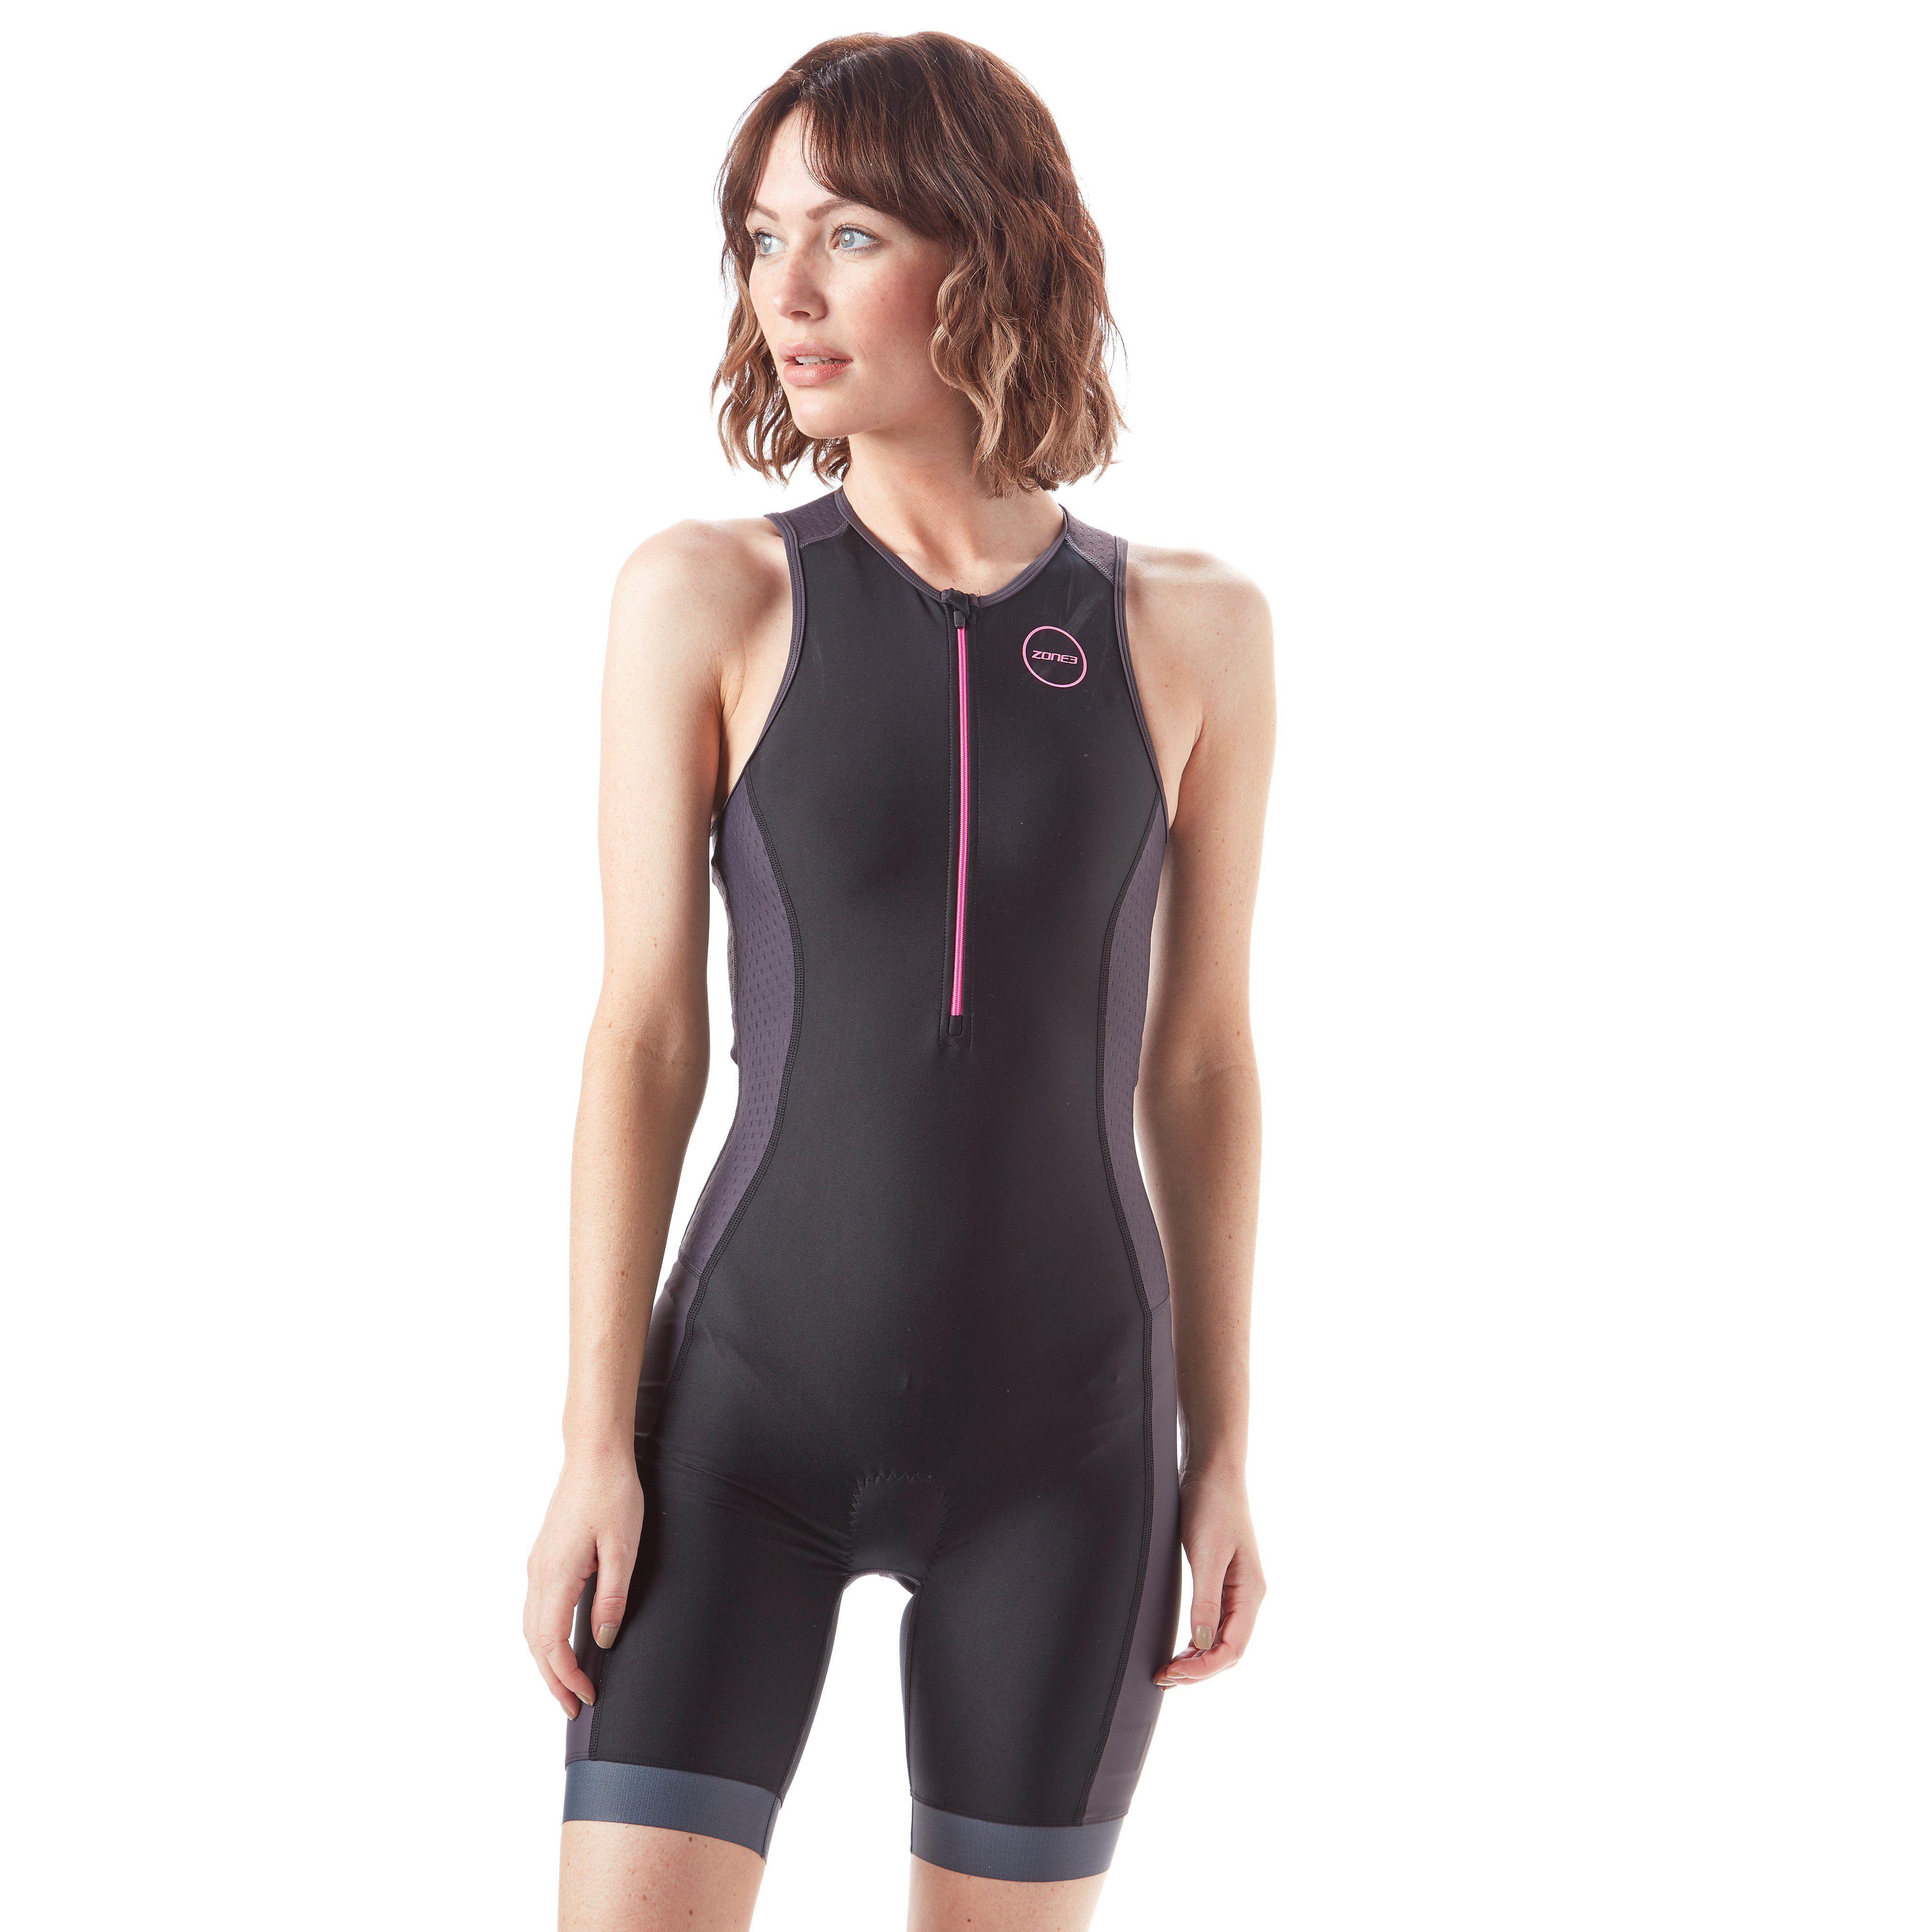 zone 3 aquaflo plus women s trisuit wetsuit girl triathlon suit swimsuits